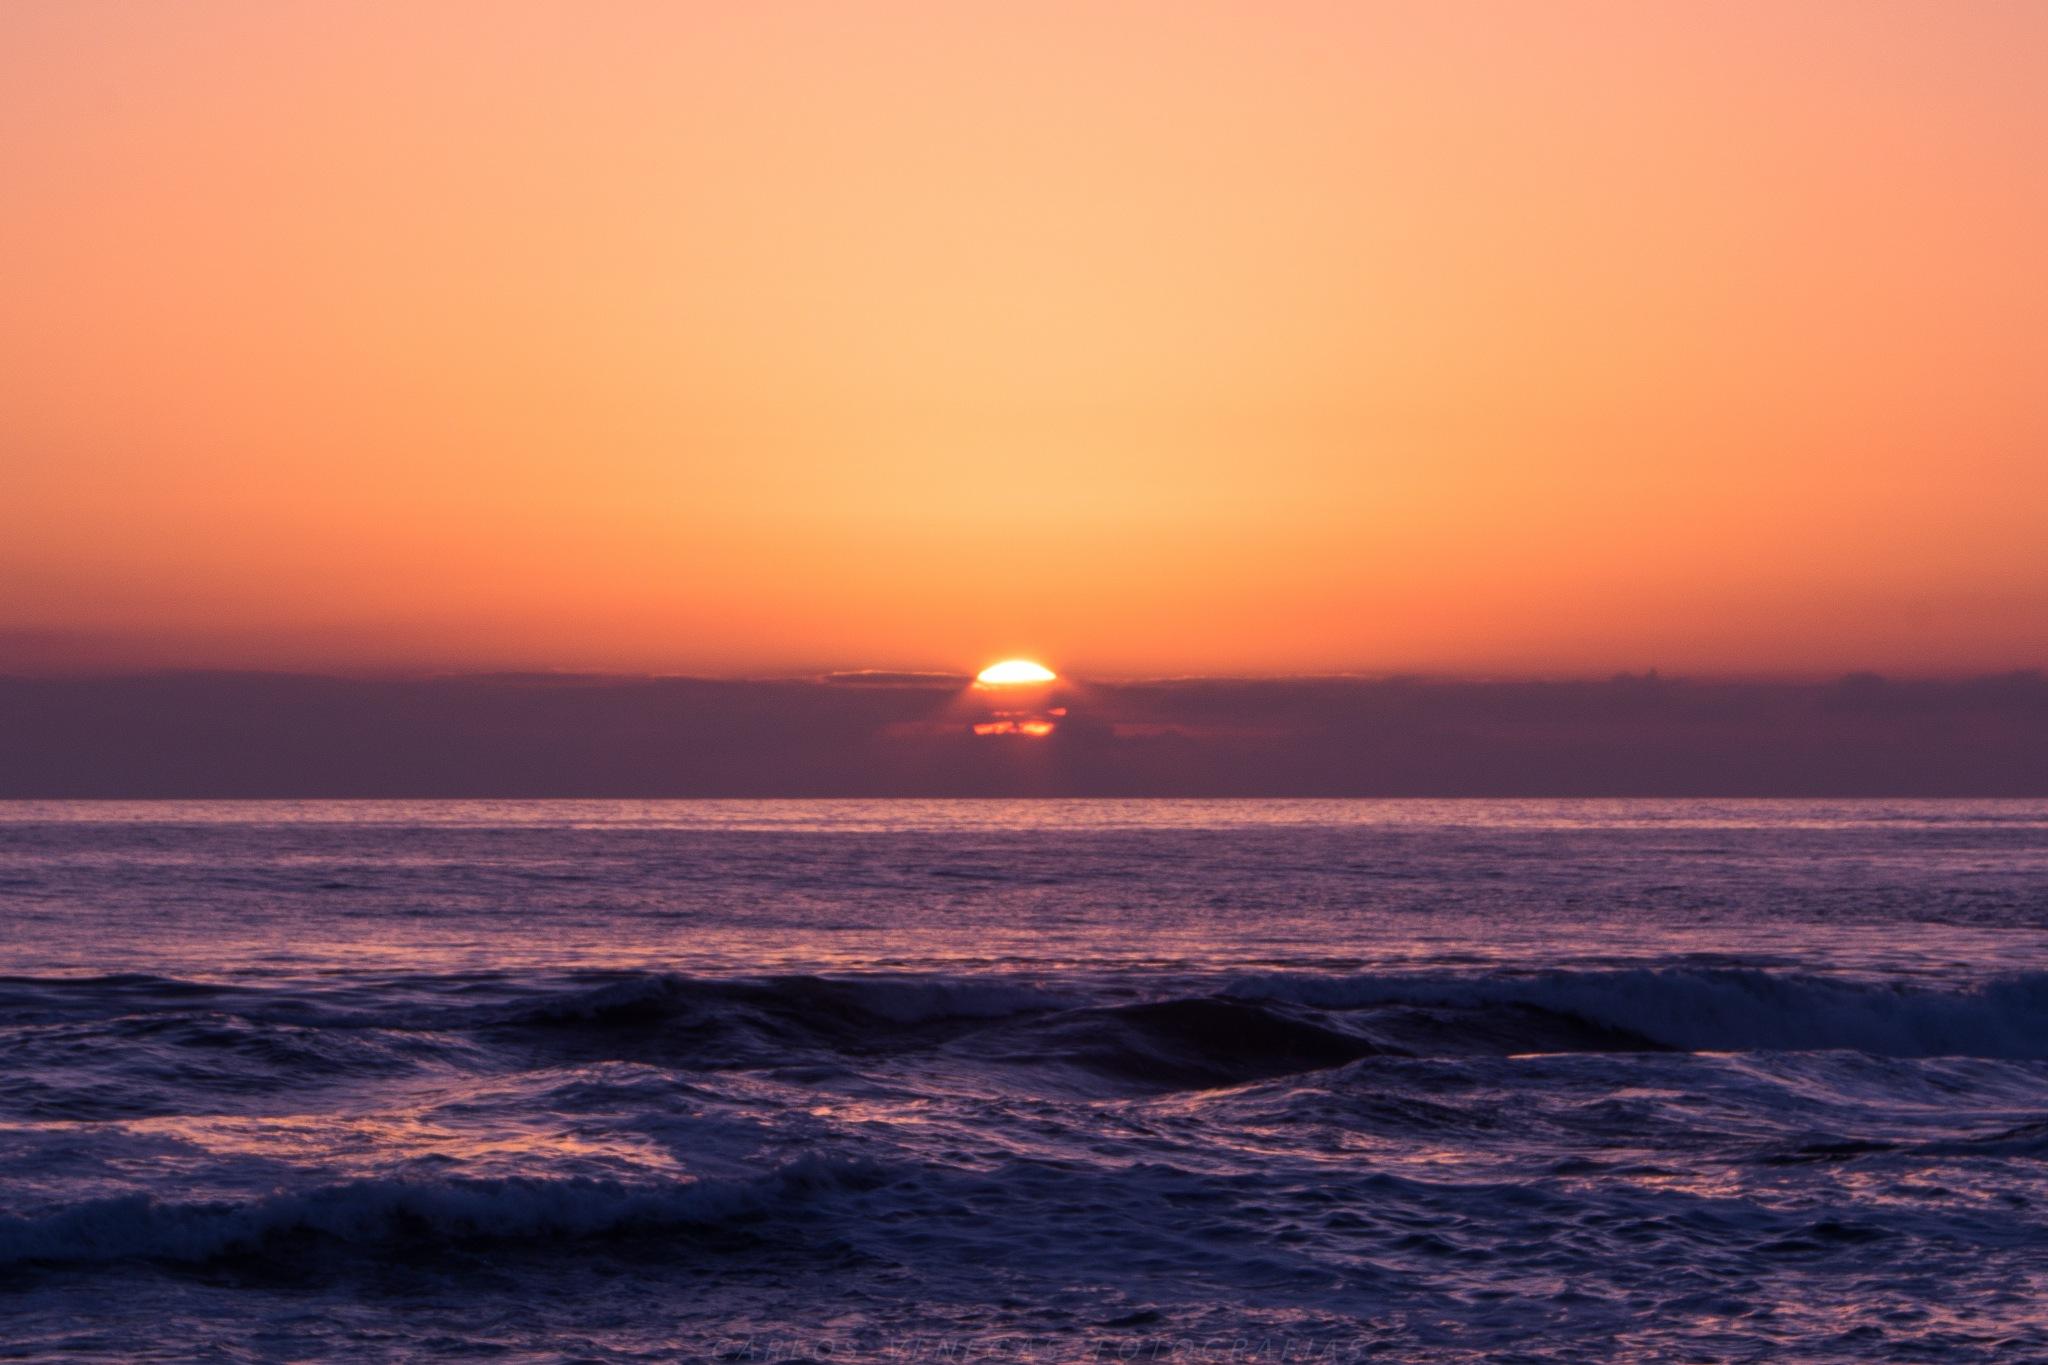 Sunset on the Sea by CarlosVenegas.